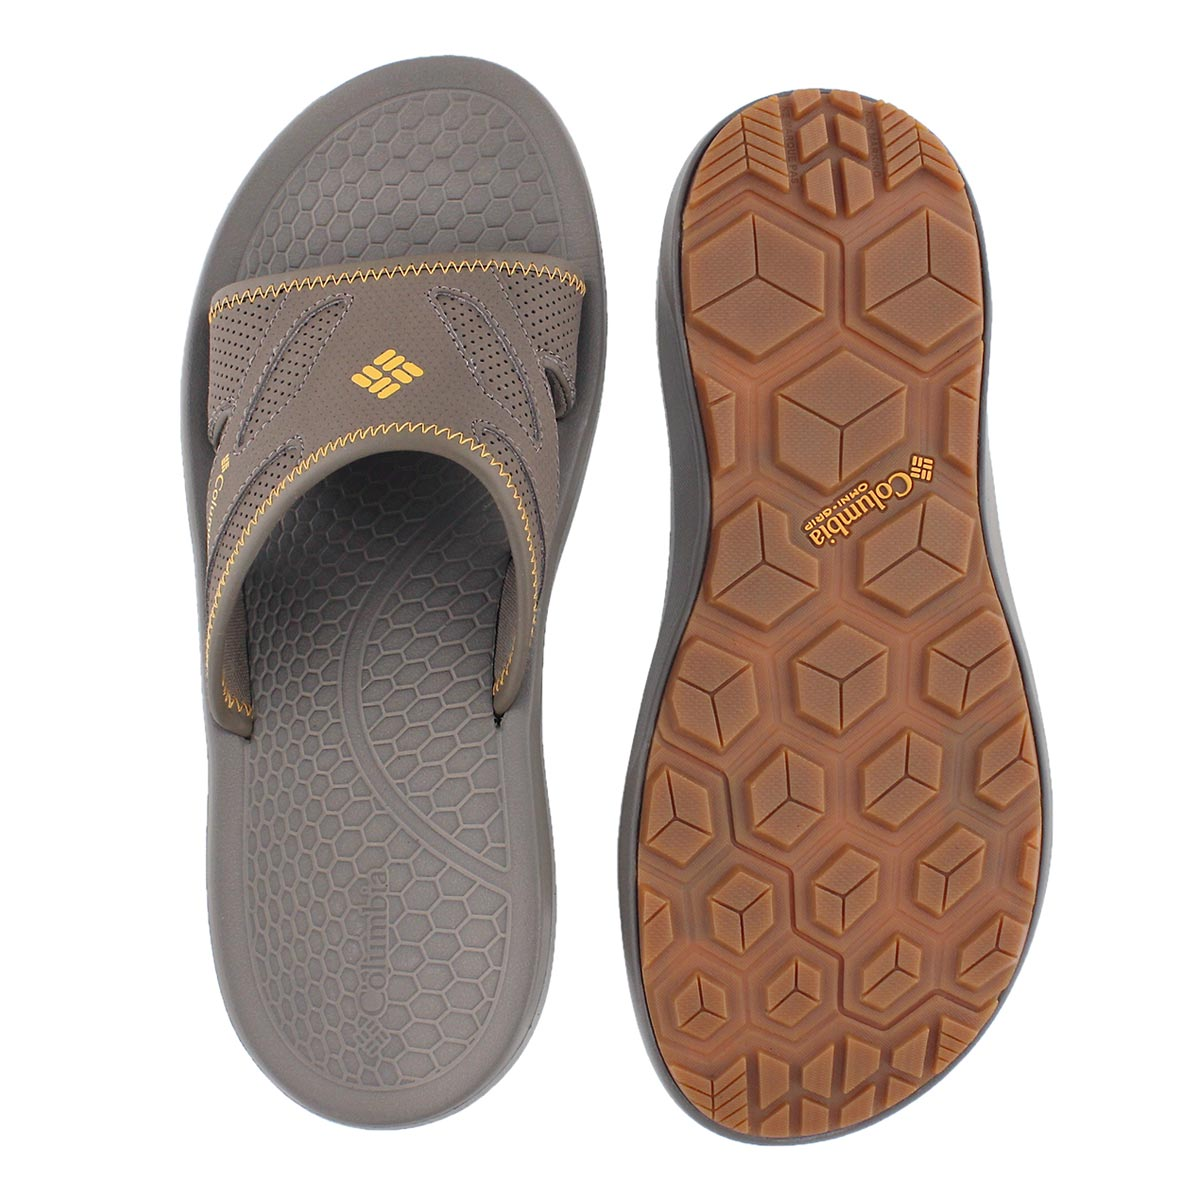 Mns Techsun Slide mud casual sandal